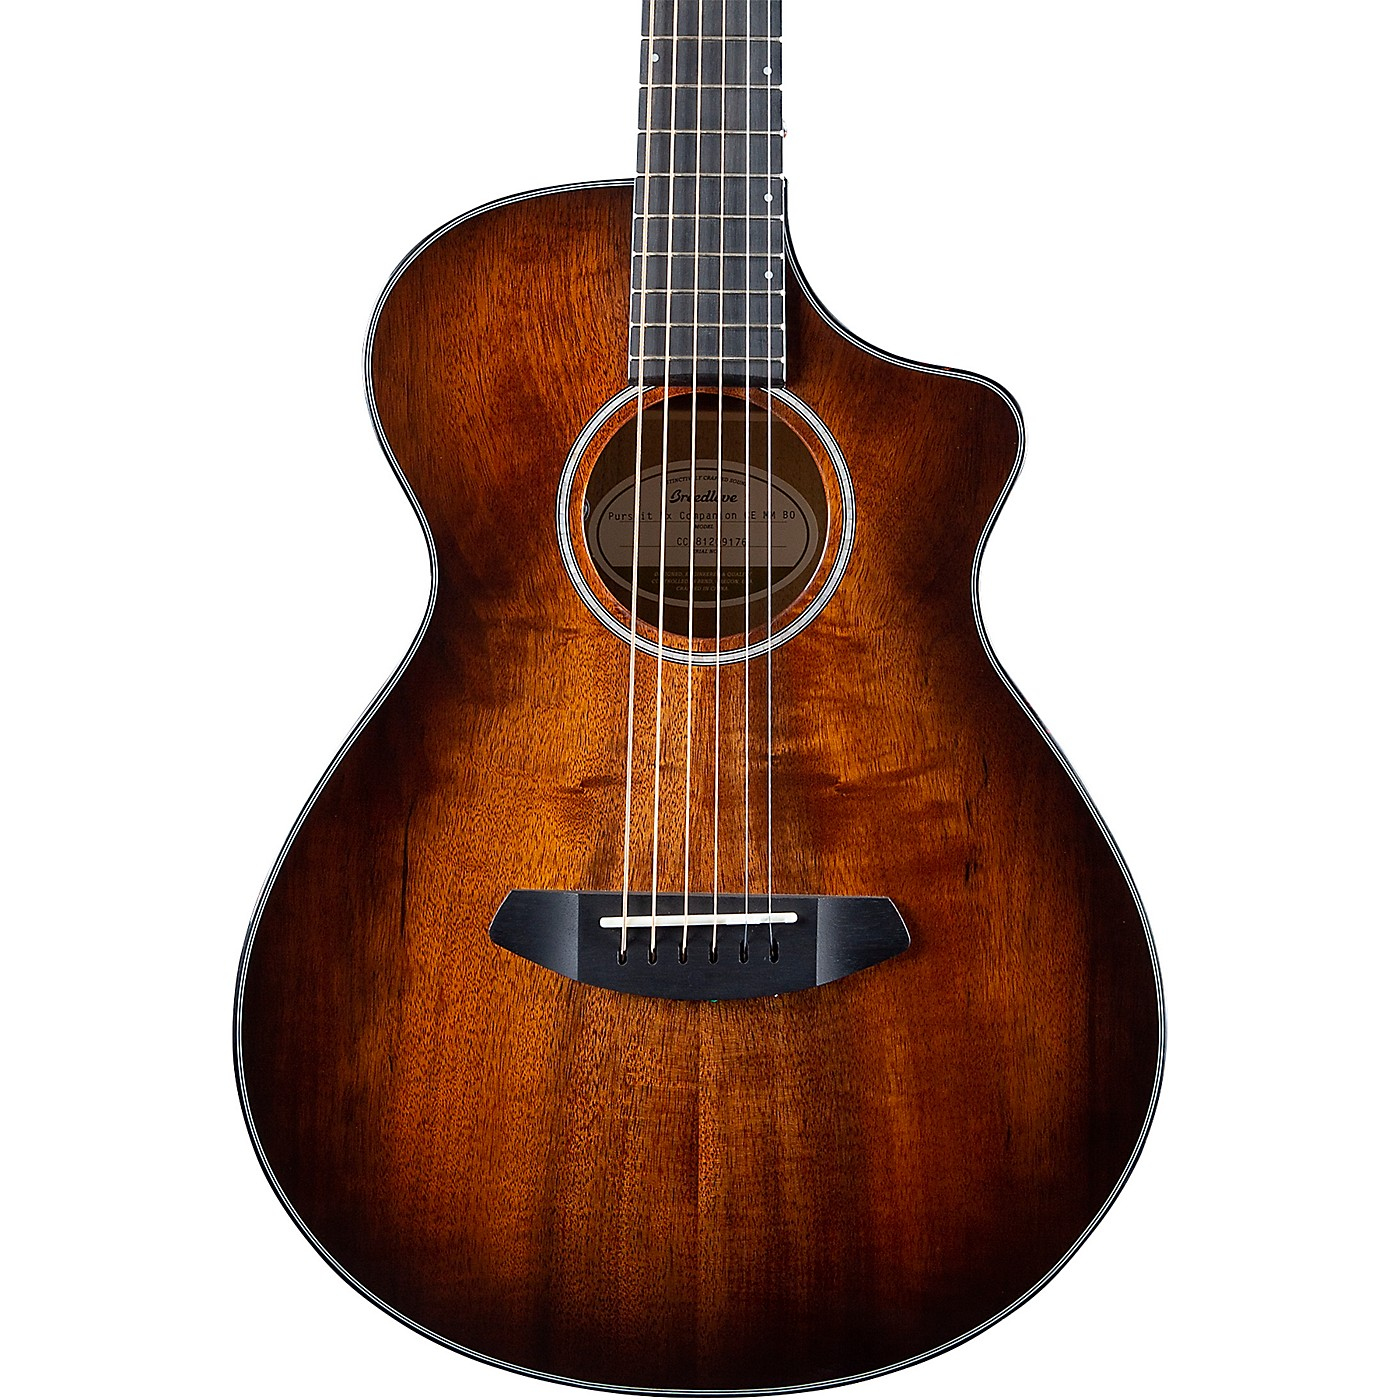 Breedlove Pursuit Exotic Companion CE Myrtlewood-Myrtlewood Travel Acoustic-Electric Guitar thumbnail